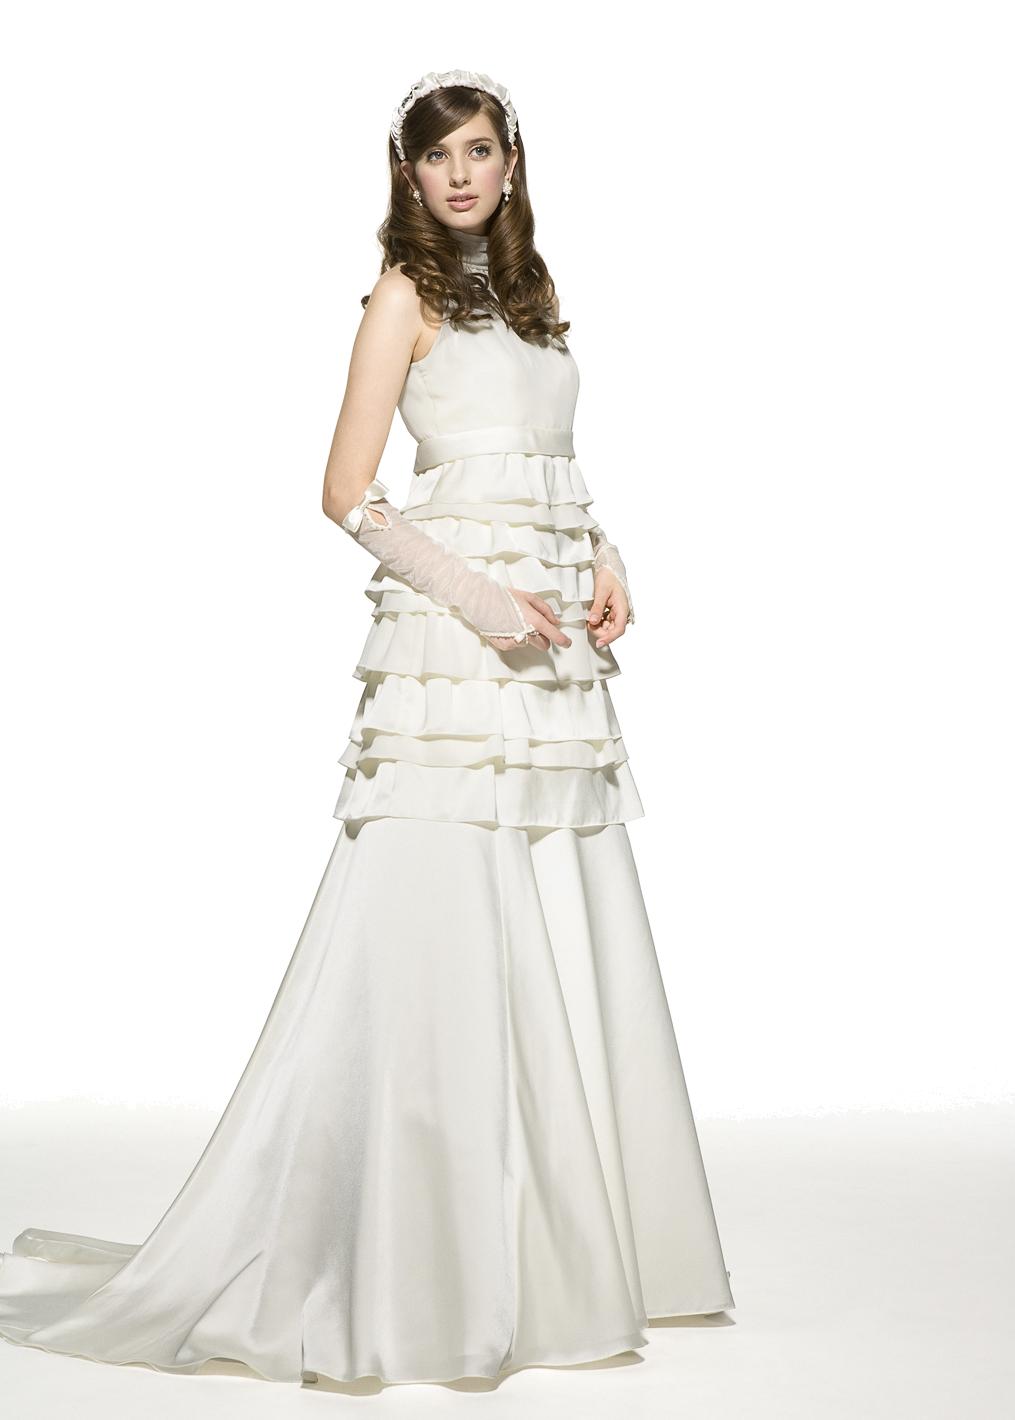 Bride Png Images Free Download